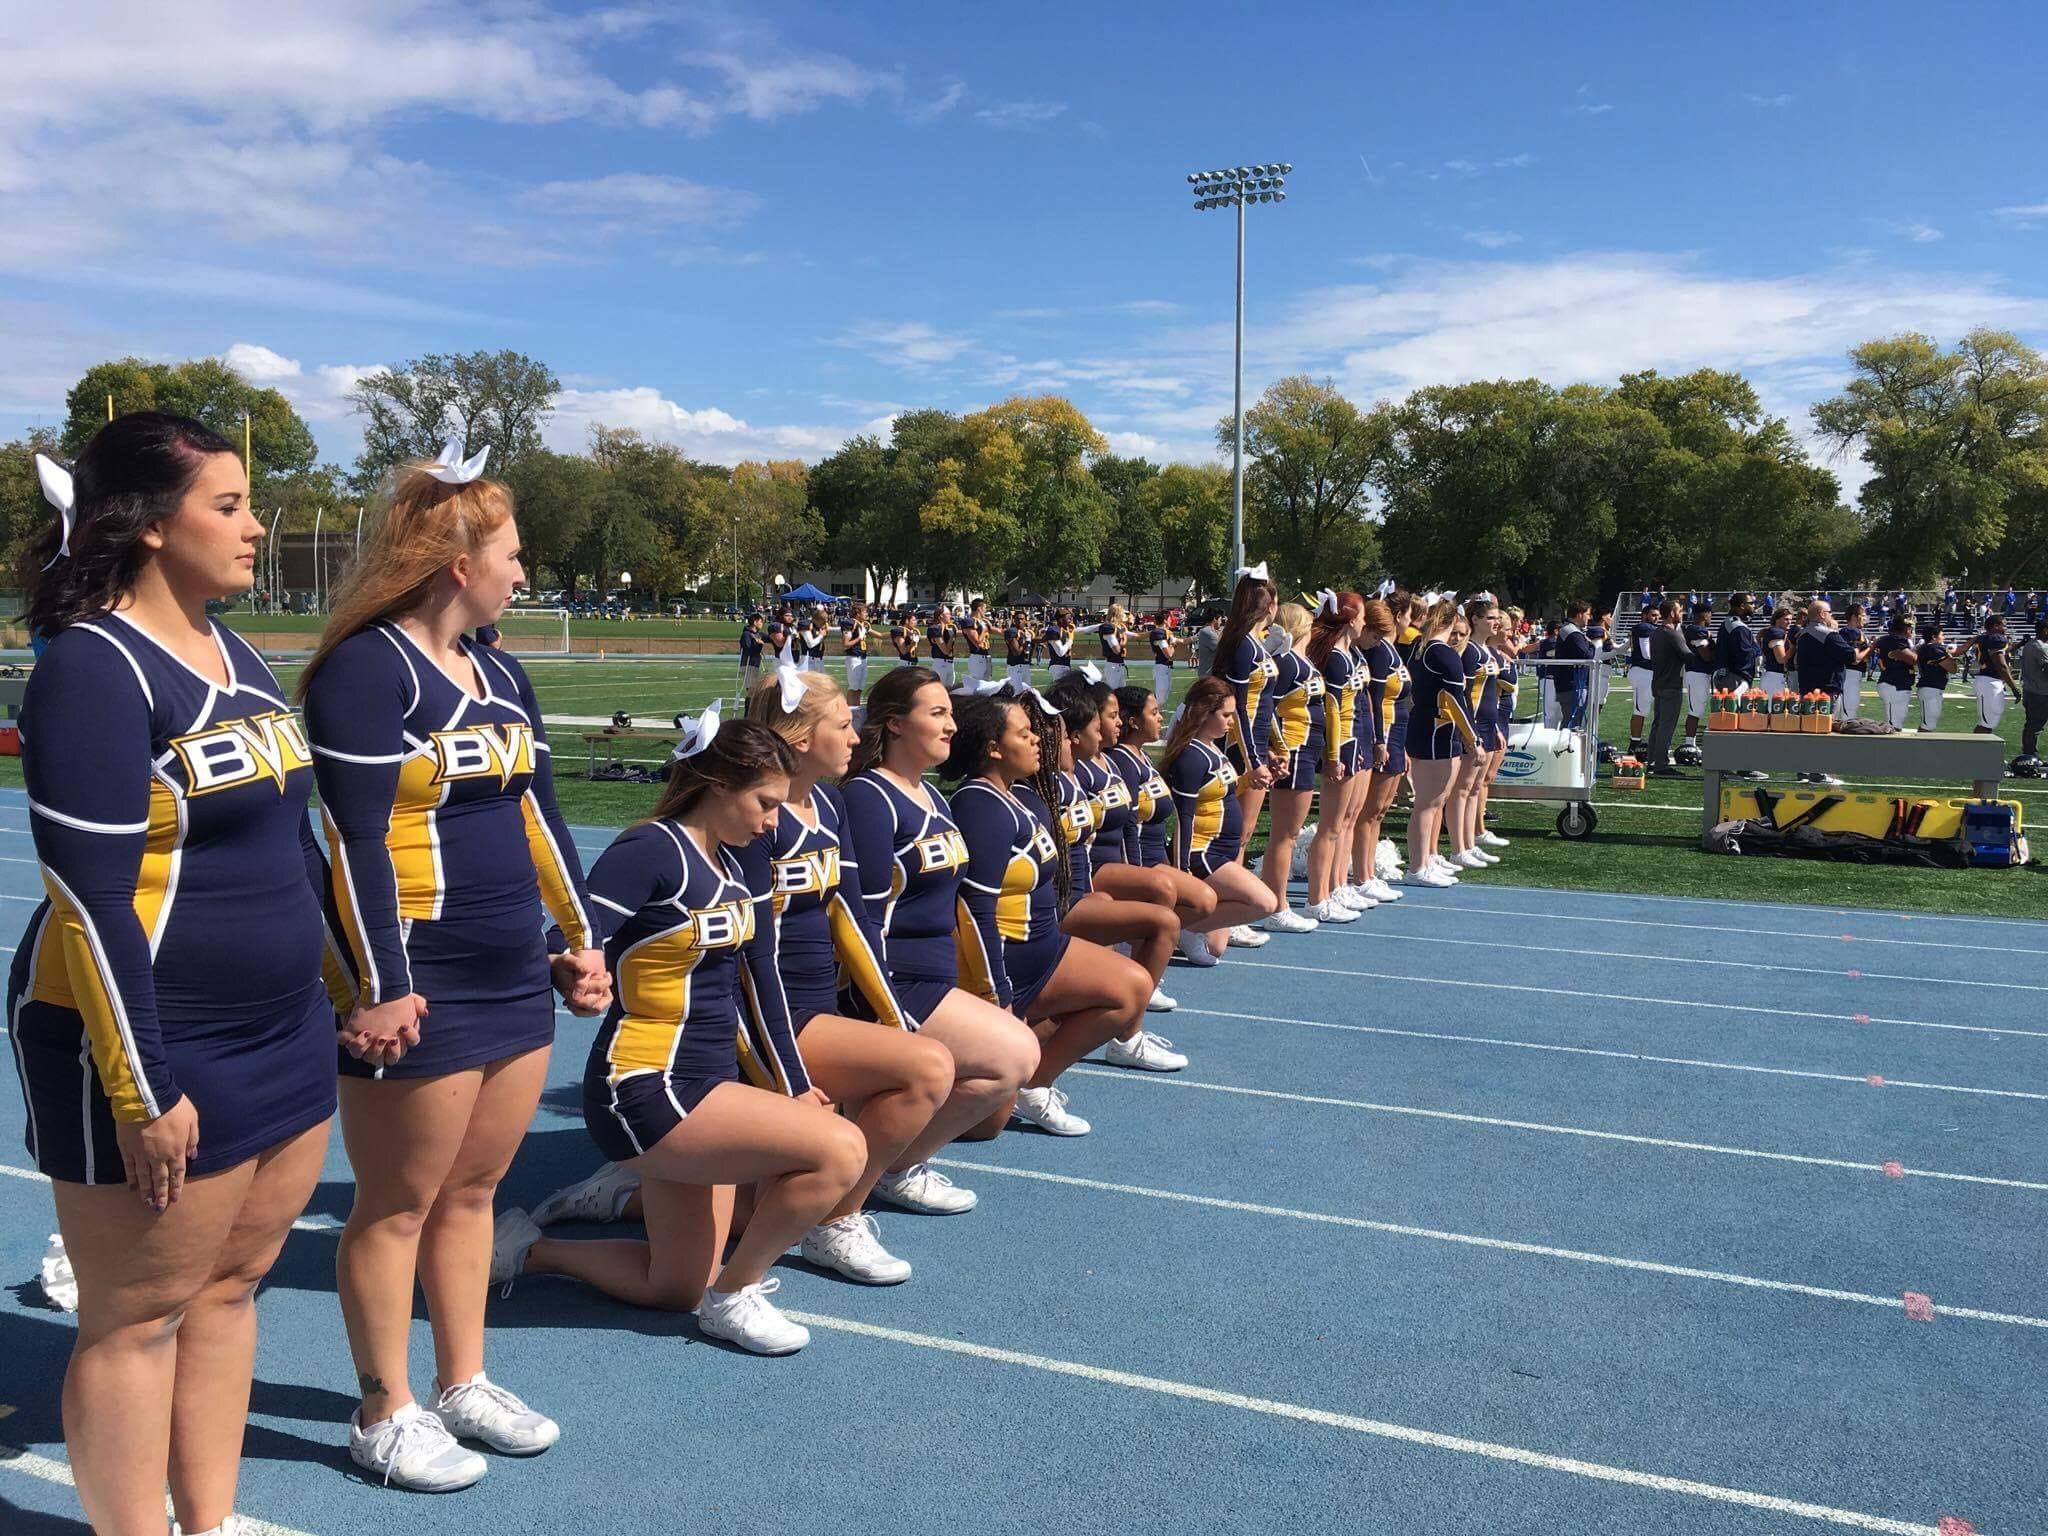 Chubby cheerleader pics